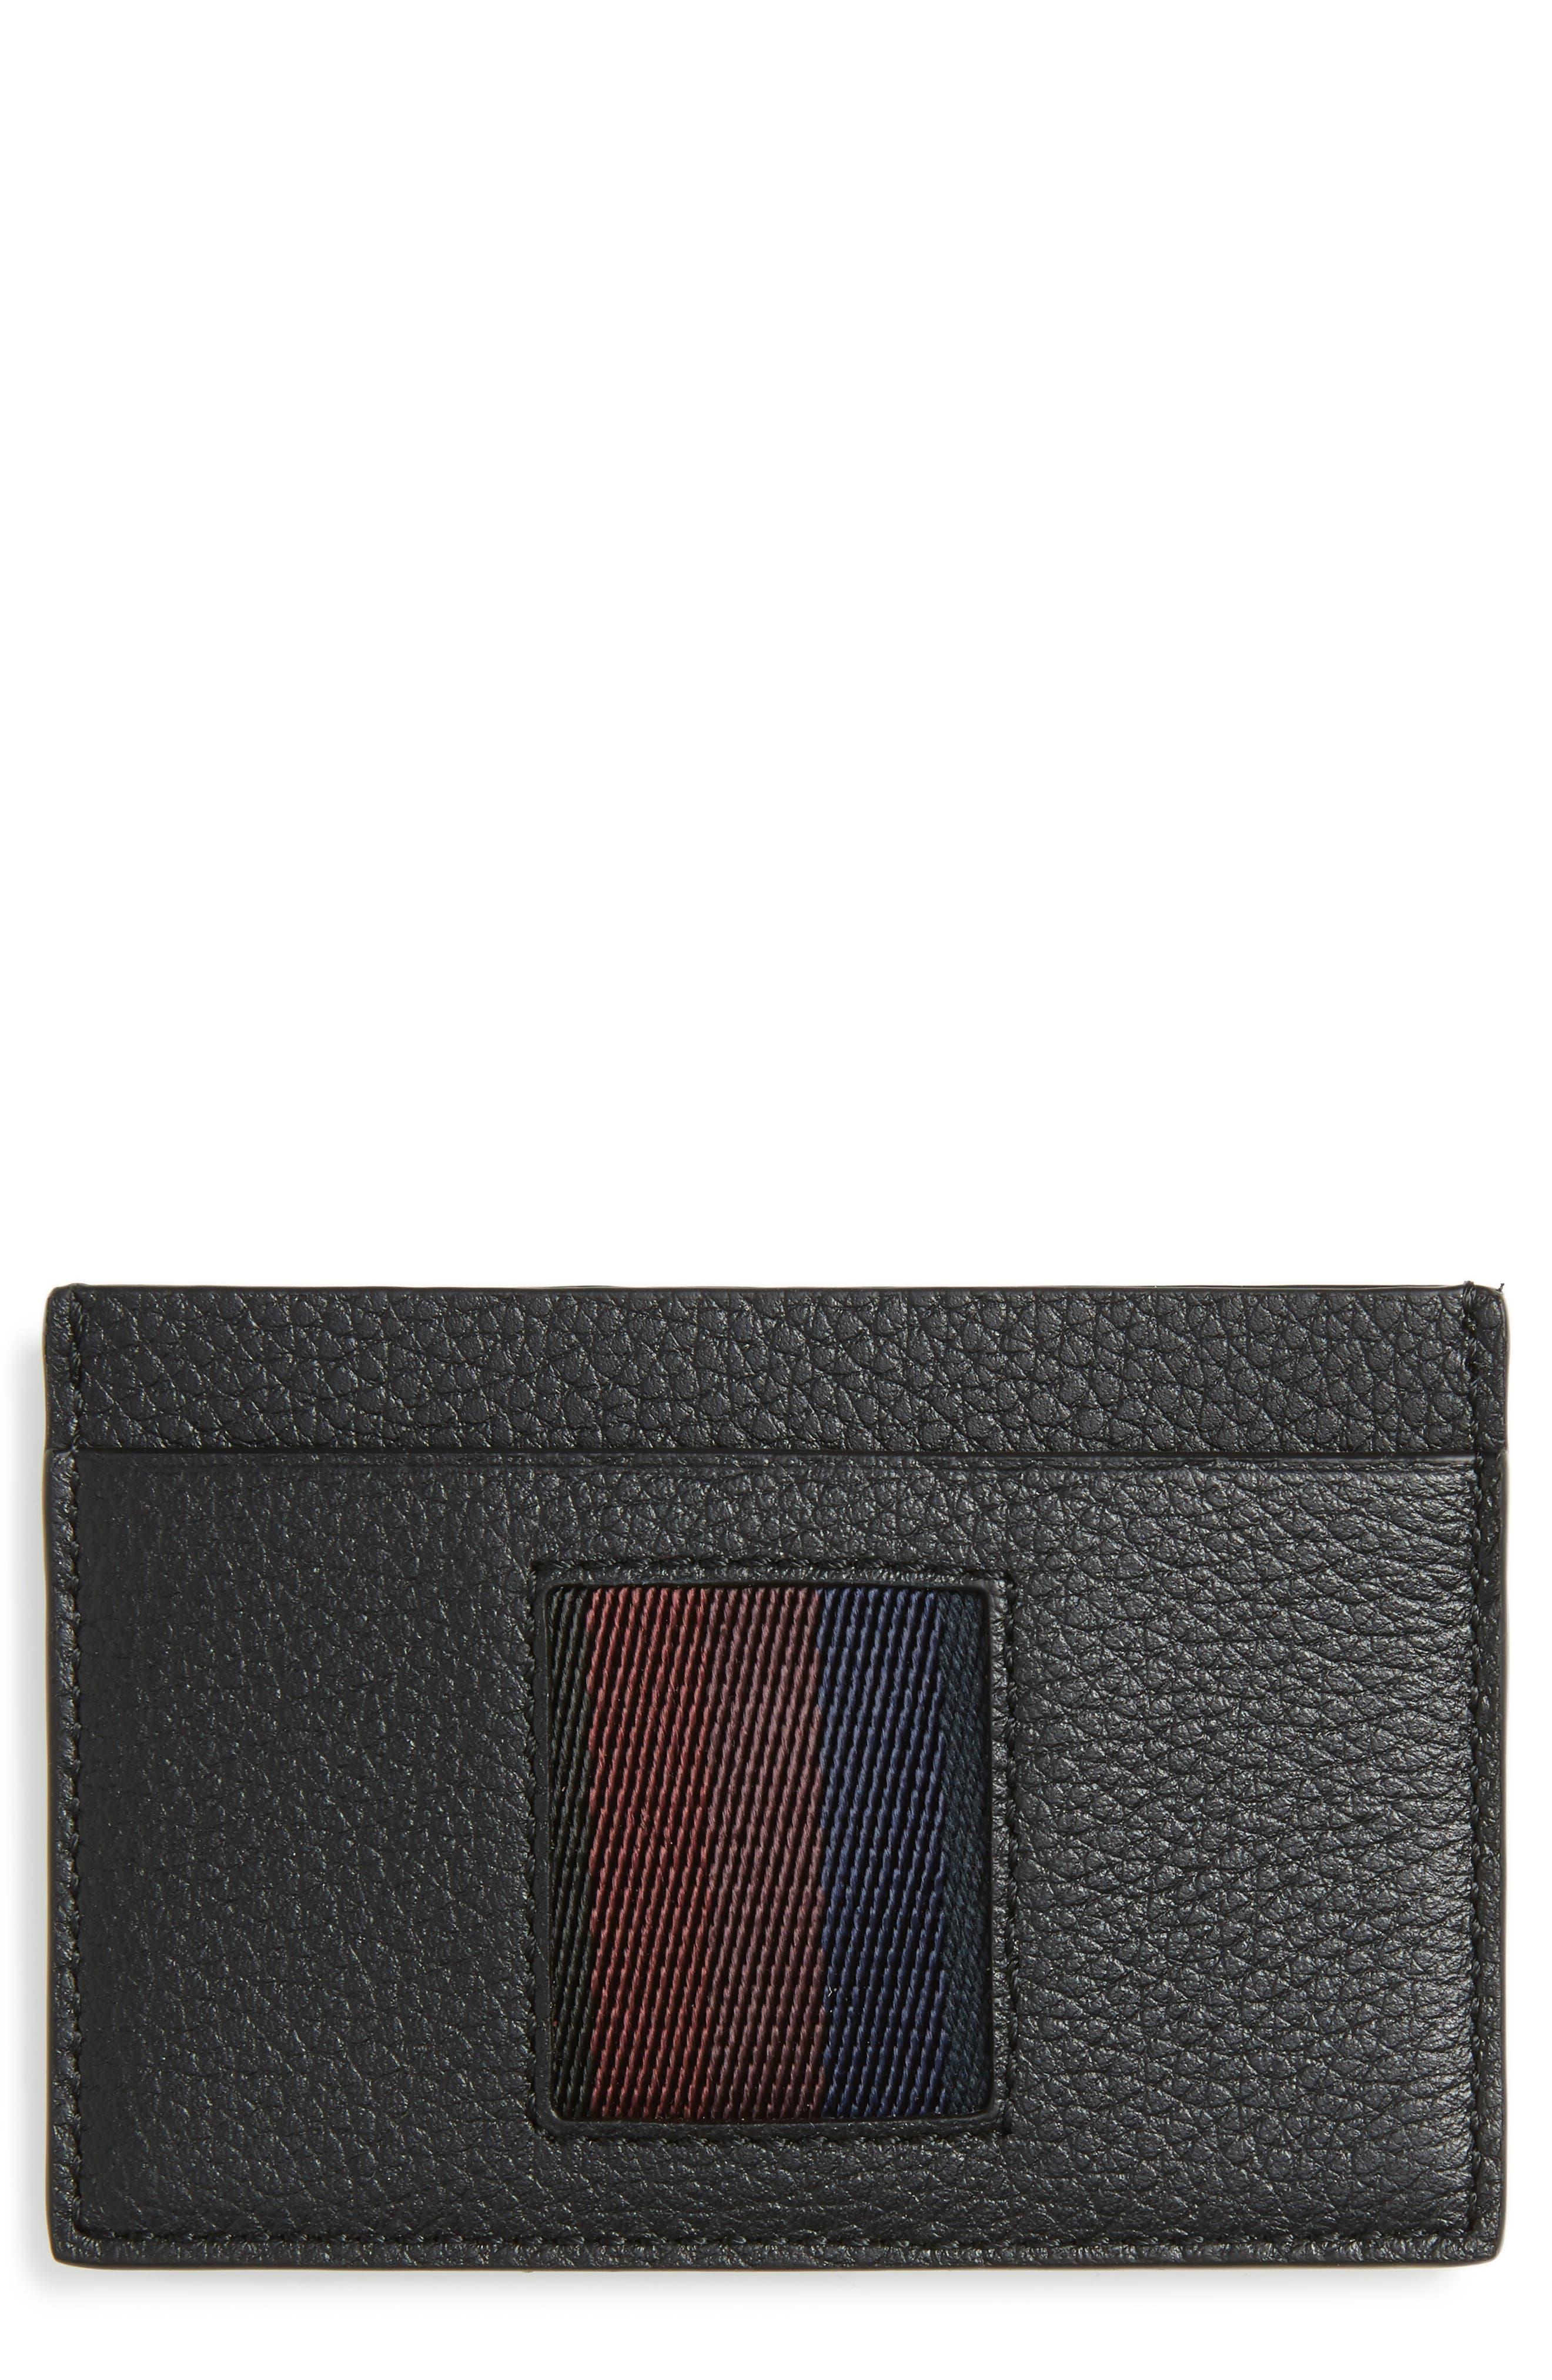 Main Image - Paul Smith Stripe Webbing Leather Card Case